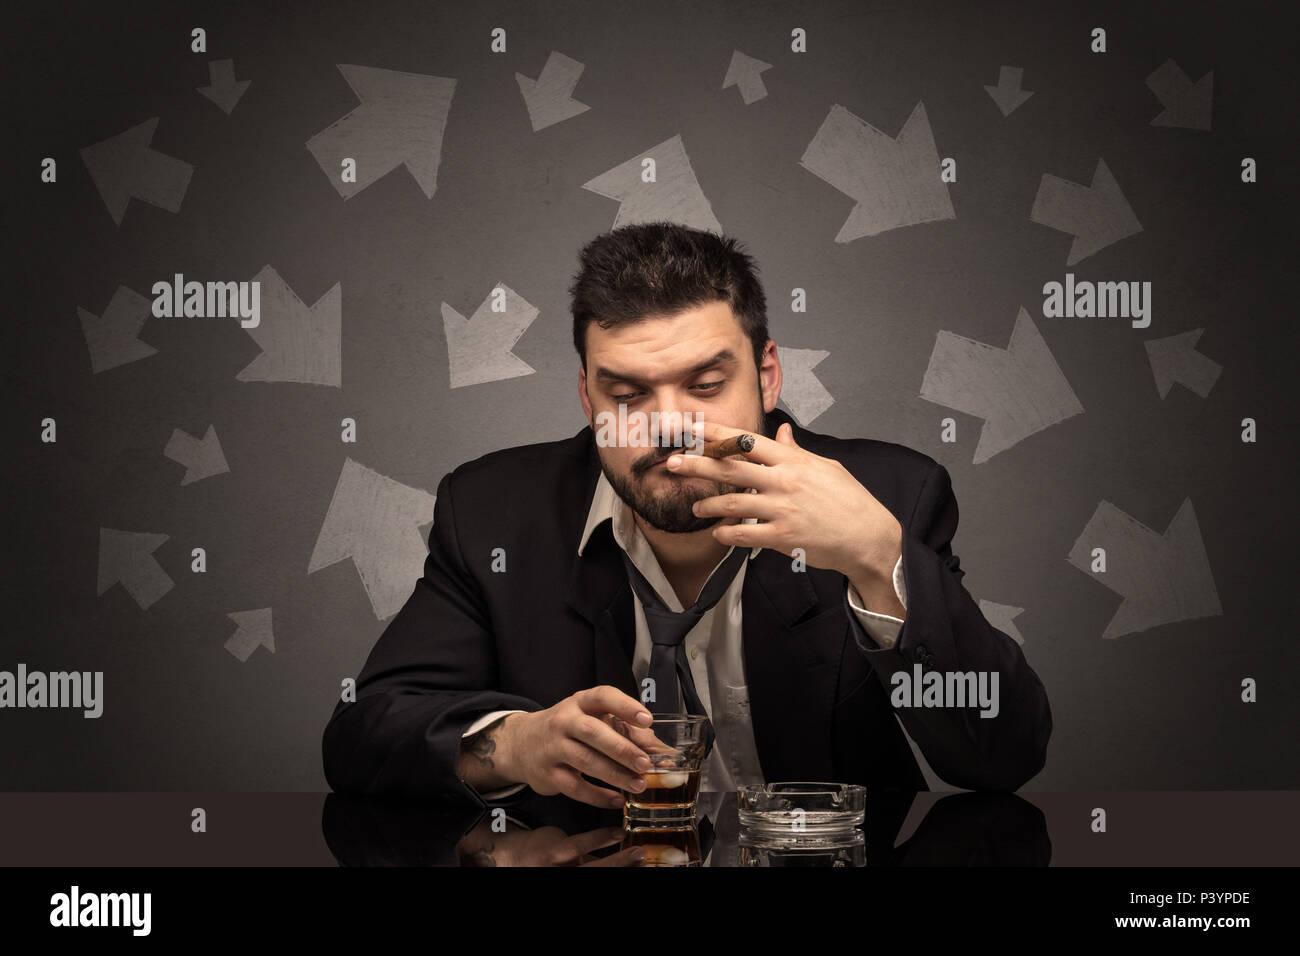 Betrunken enttäuscht Mann am Tisch sitzen mit Pfeilen um Stockfoto